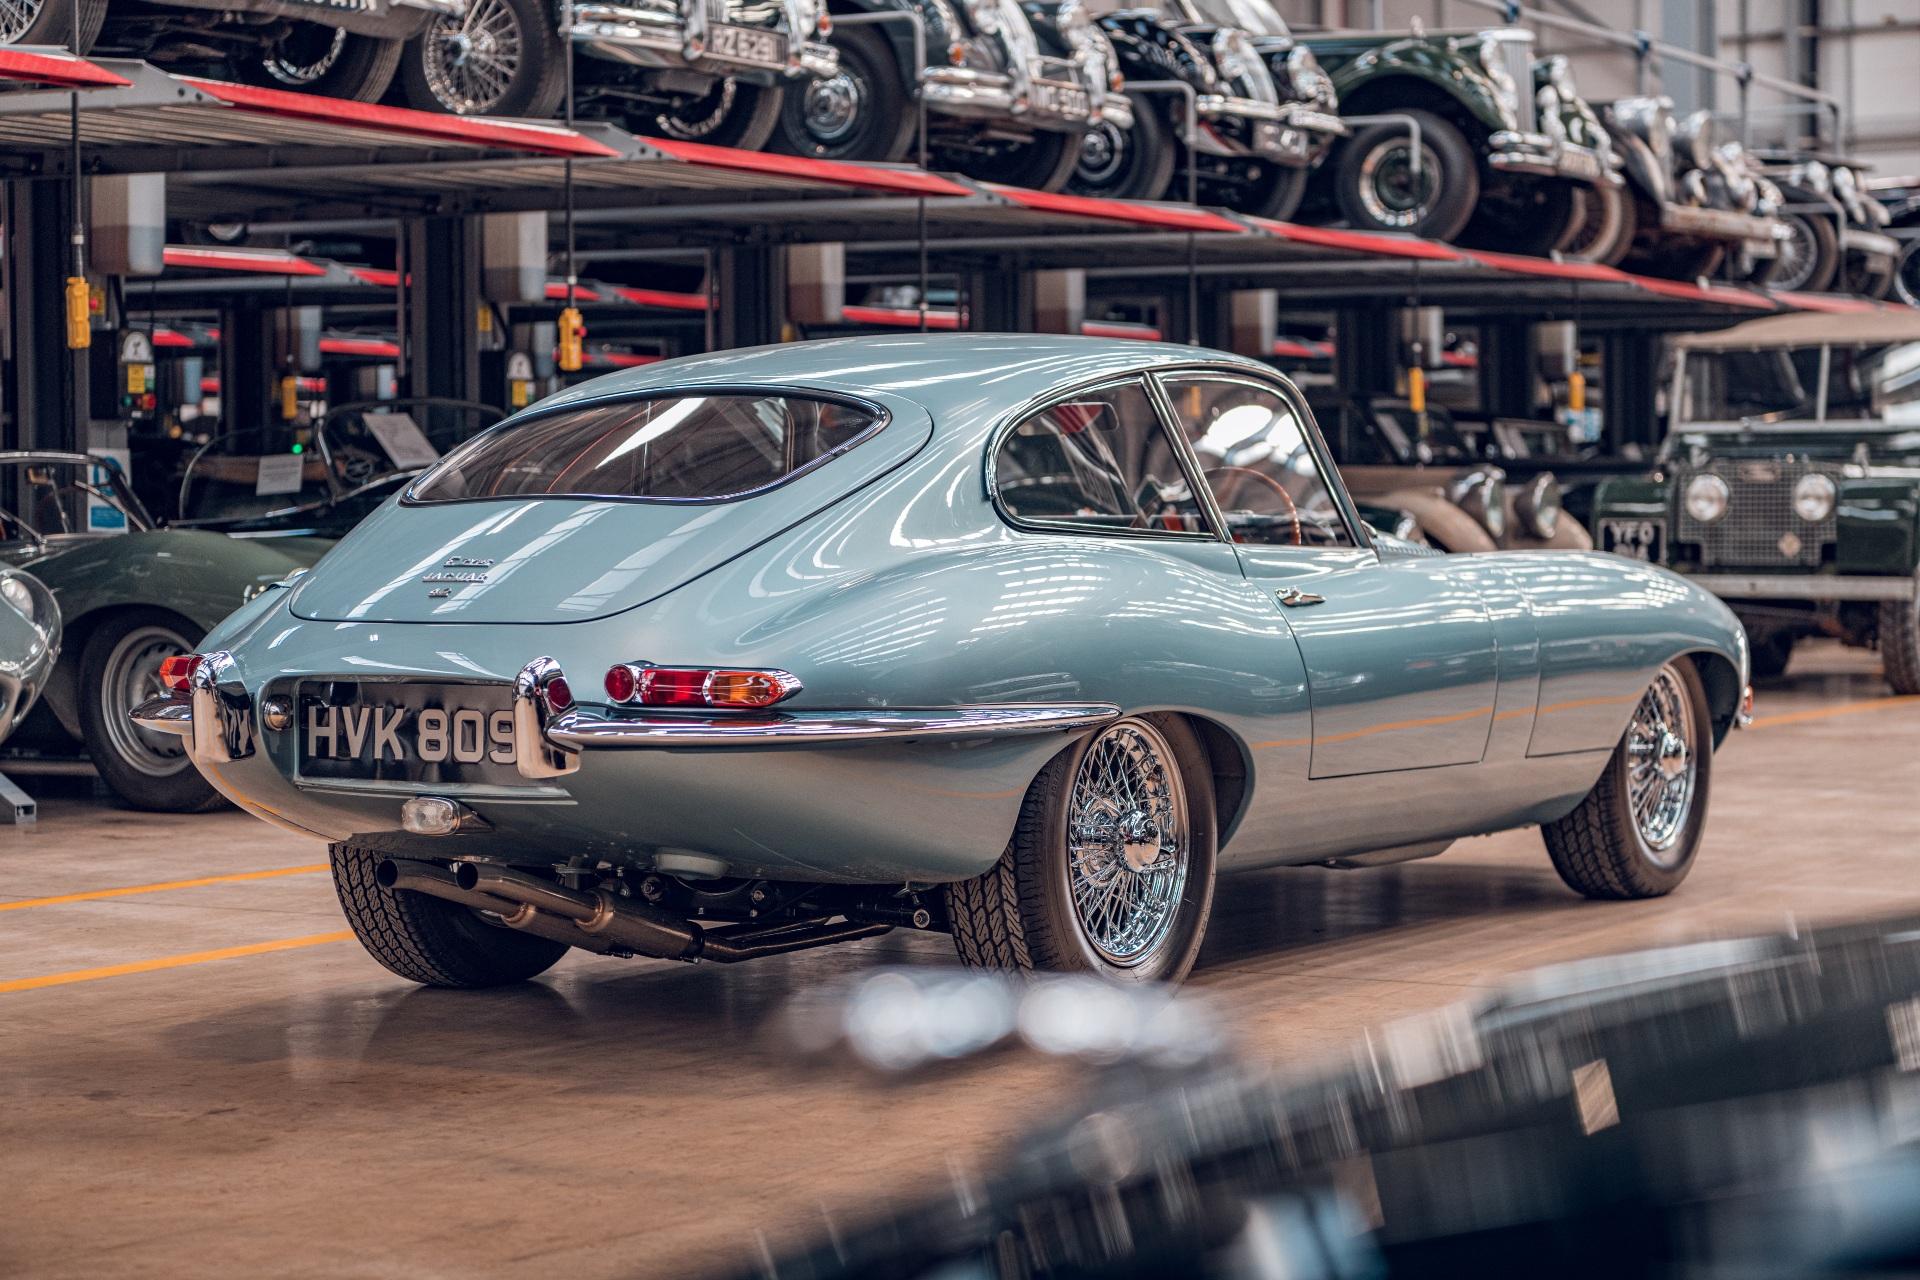 Jaguar E-Type Reborn 1965 Series 1 4.2 shop